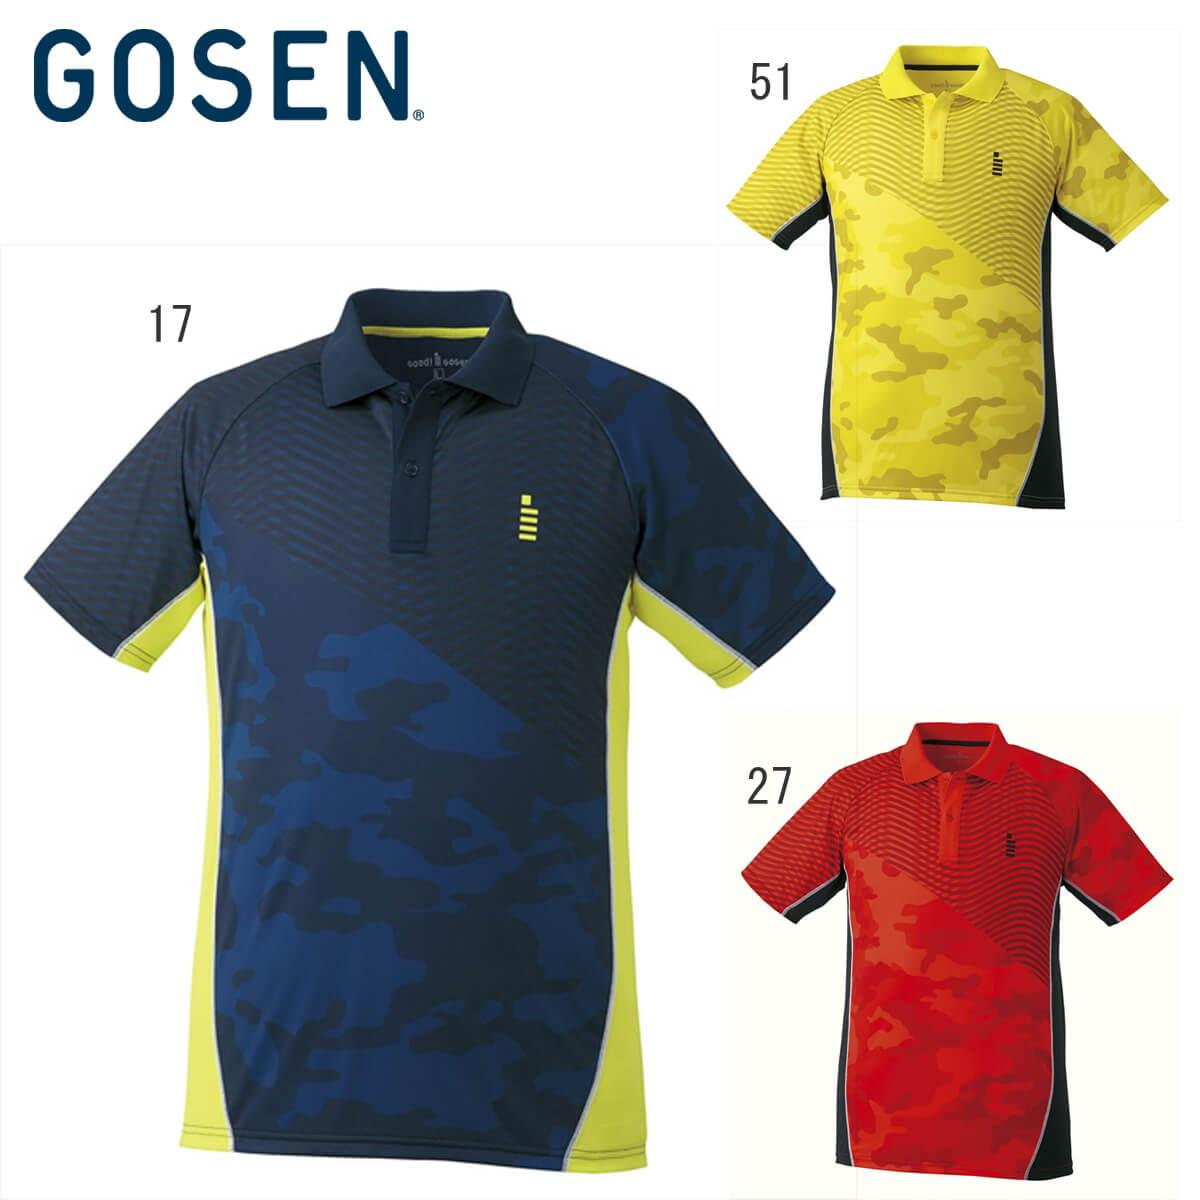 GOSEN T1728 ブランド品 テニス バドミントン ウェア メンズ ゴーセン メール便可 チープ ユニ ゲームシャツ 2017年秋冬モデル 取り寄せ